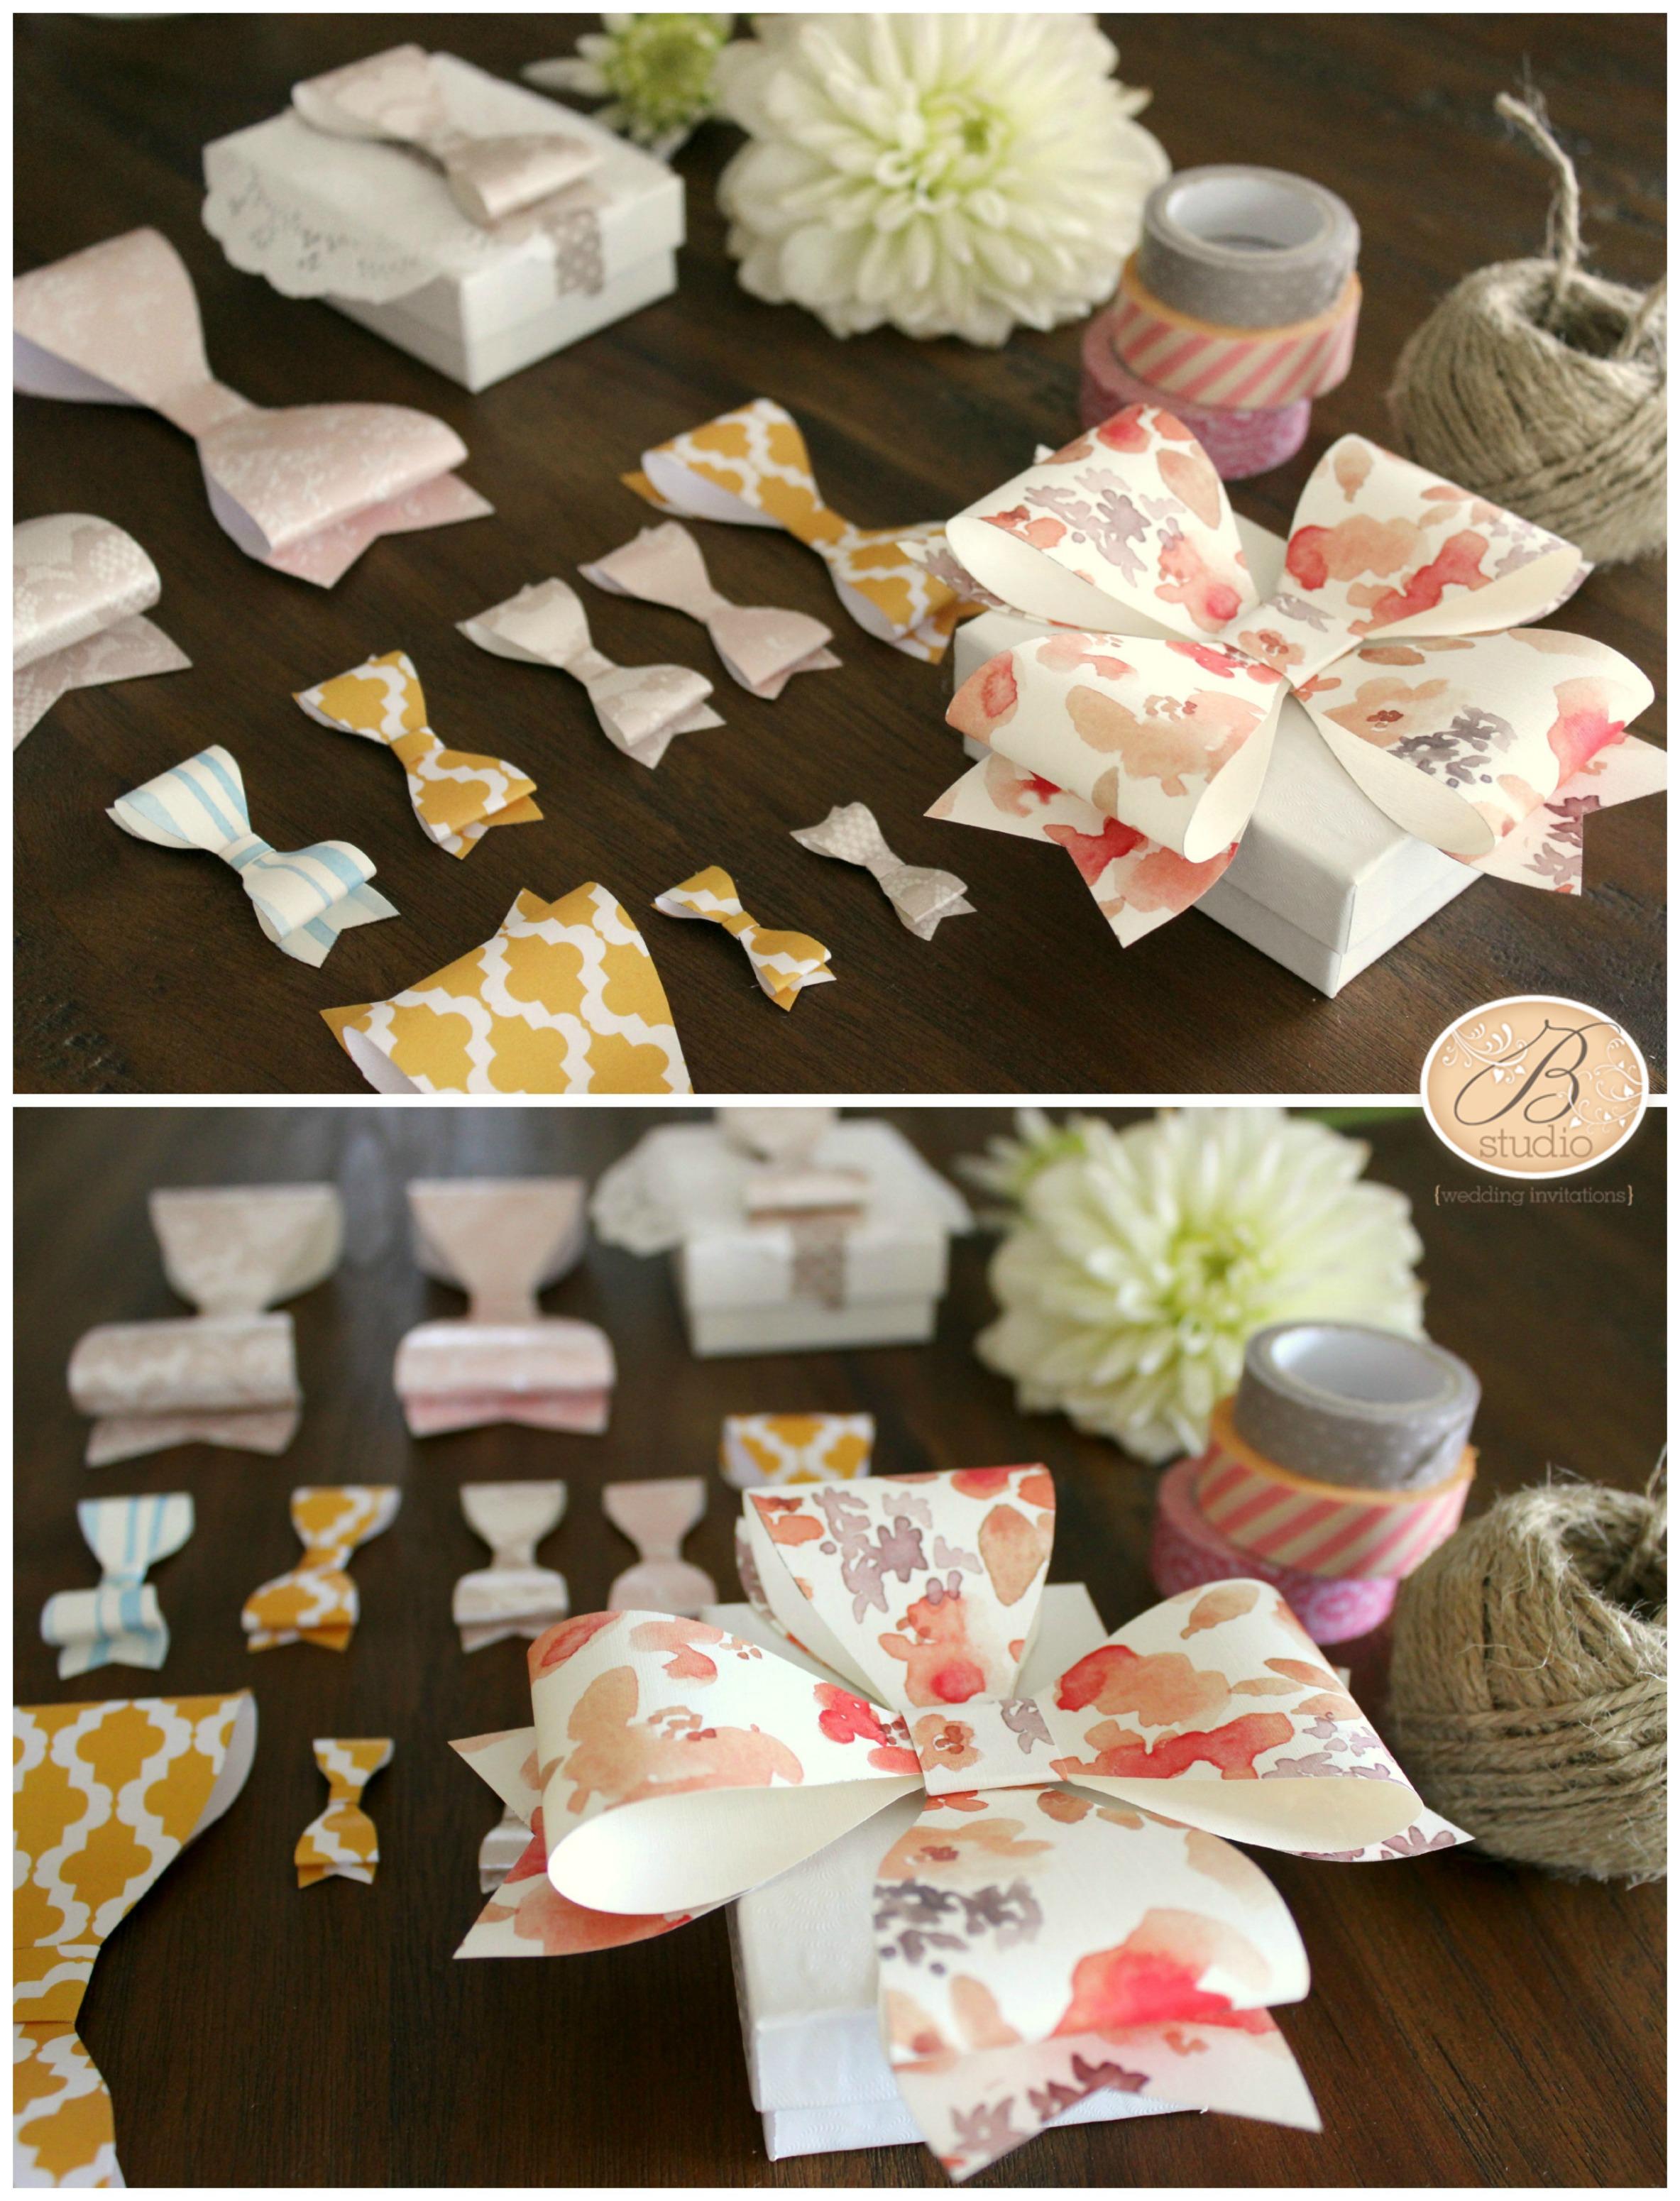 wedding – B Studio Wedding Invitations - Style Blog